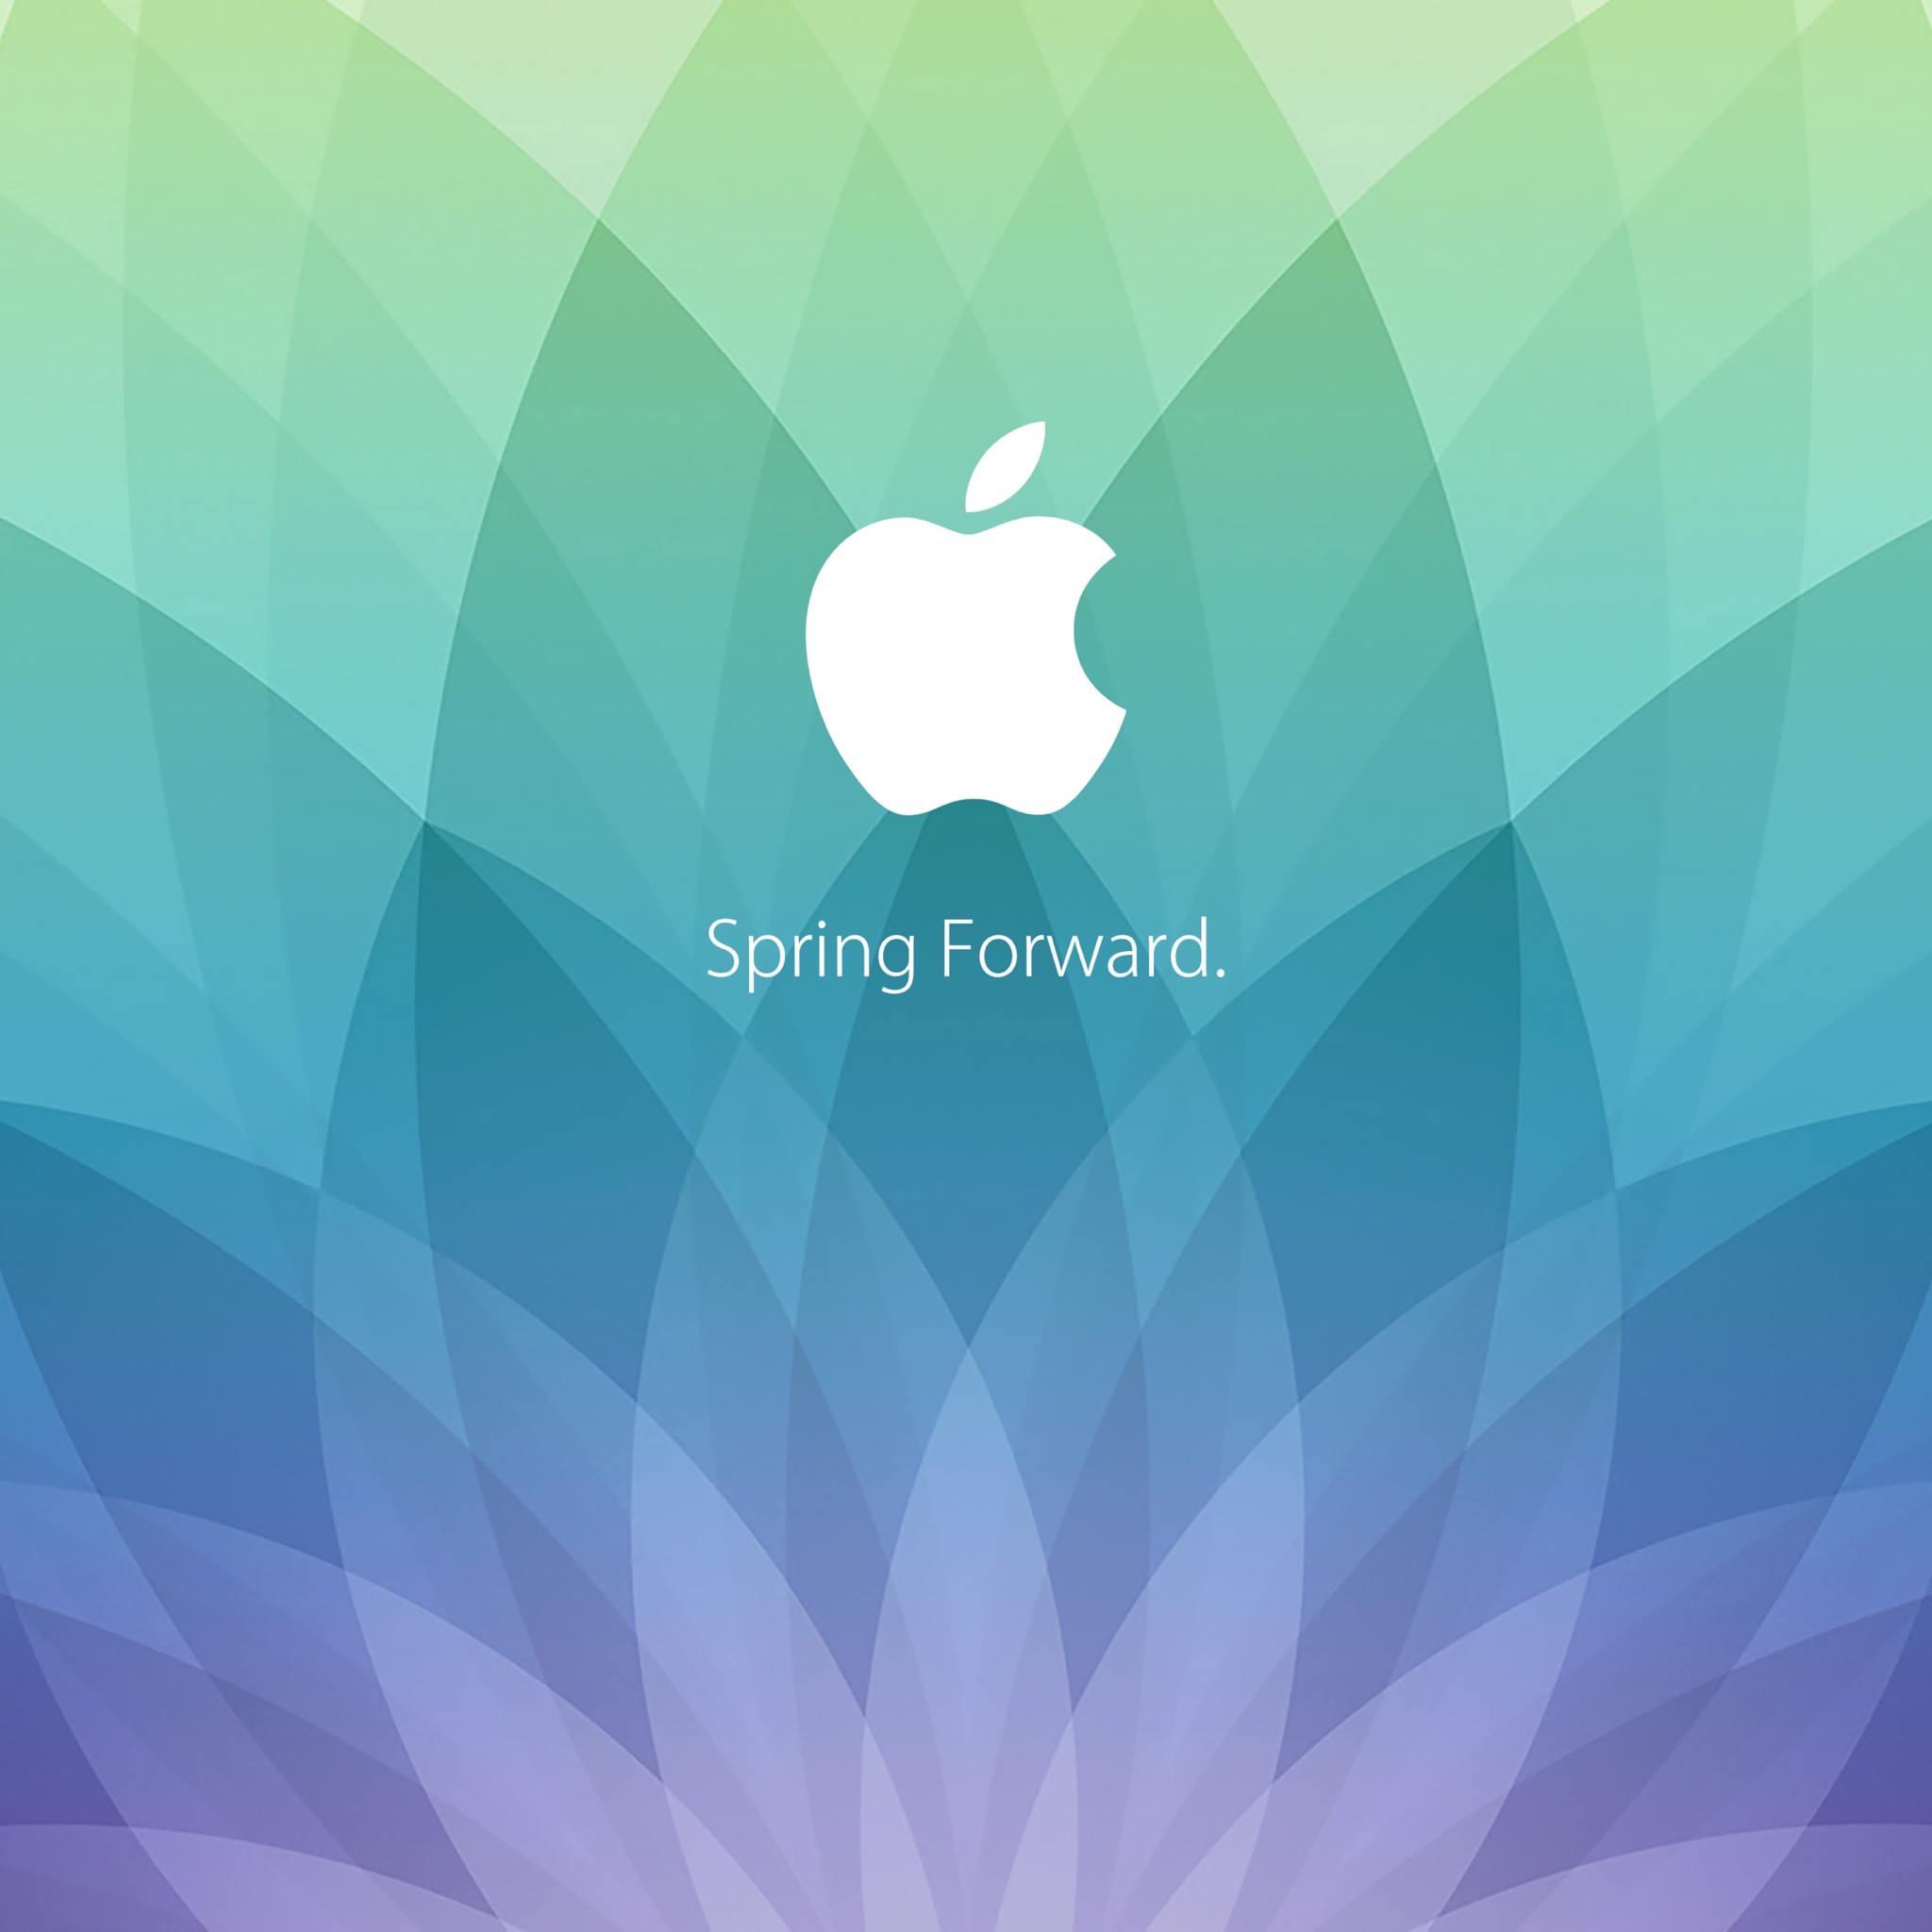 iPad Fondo de pantalla